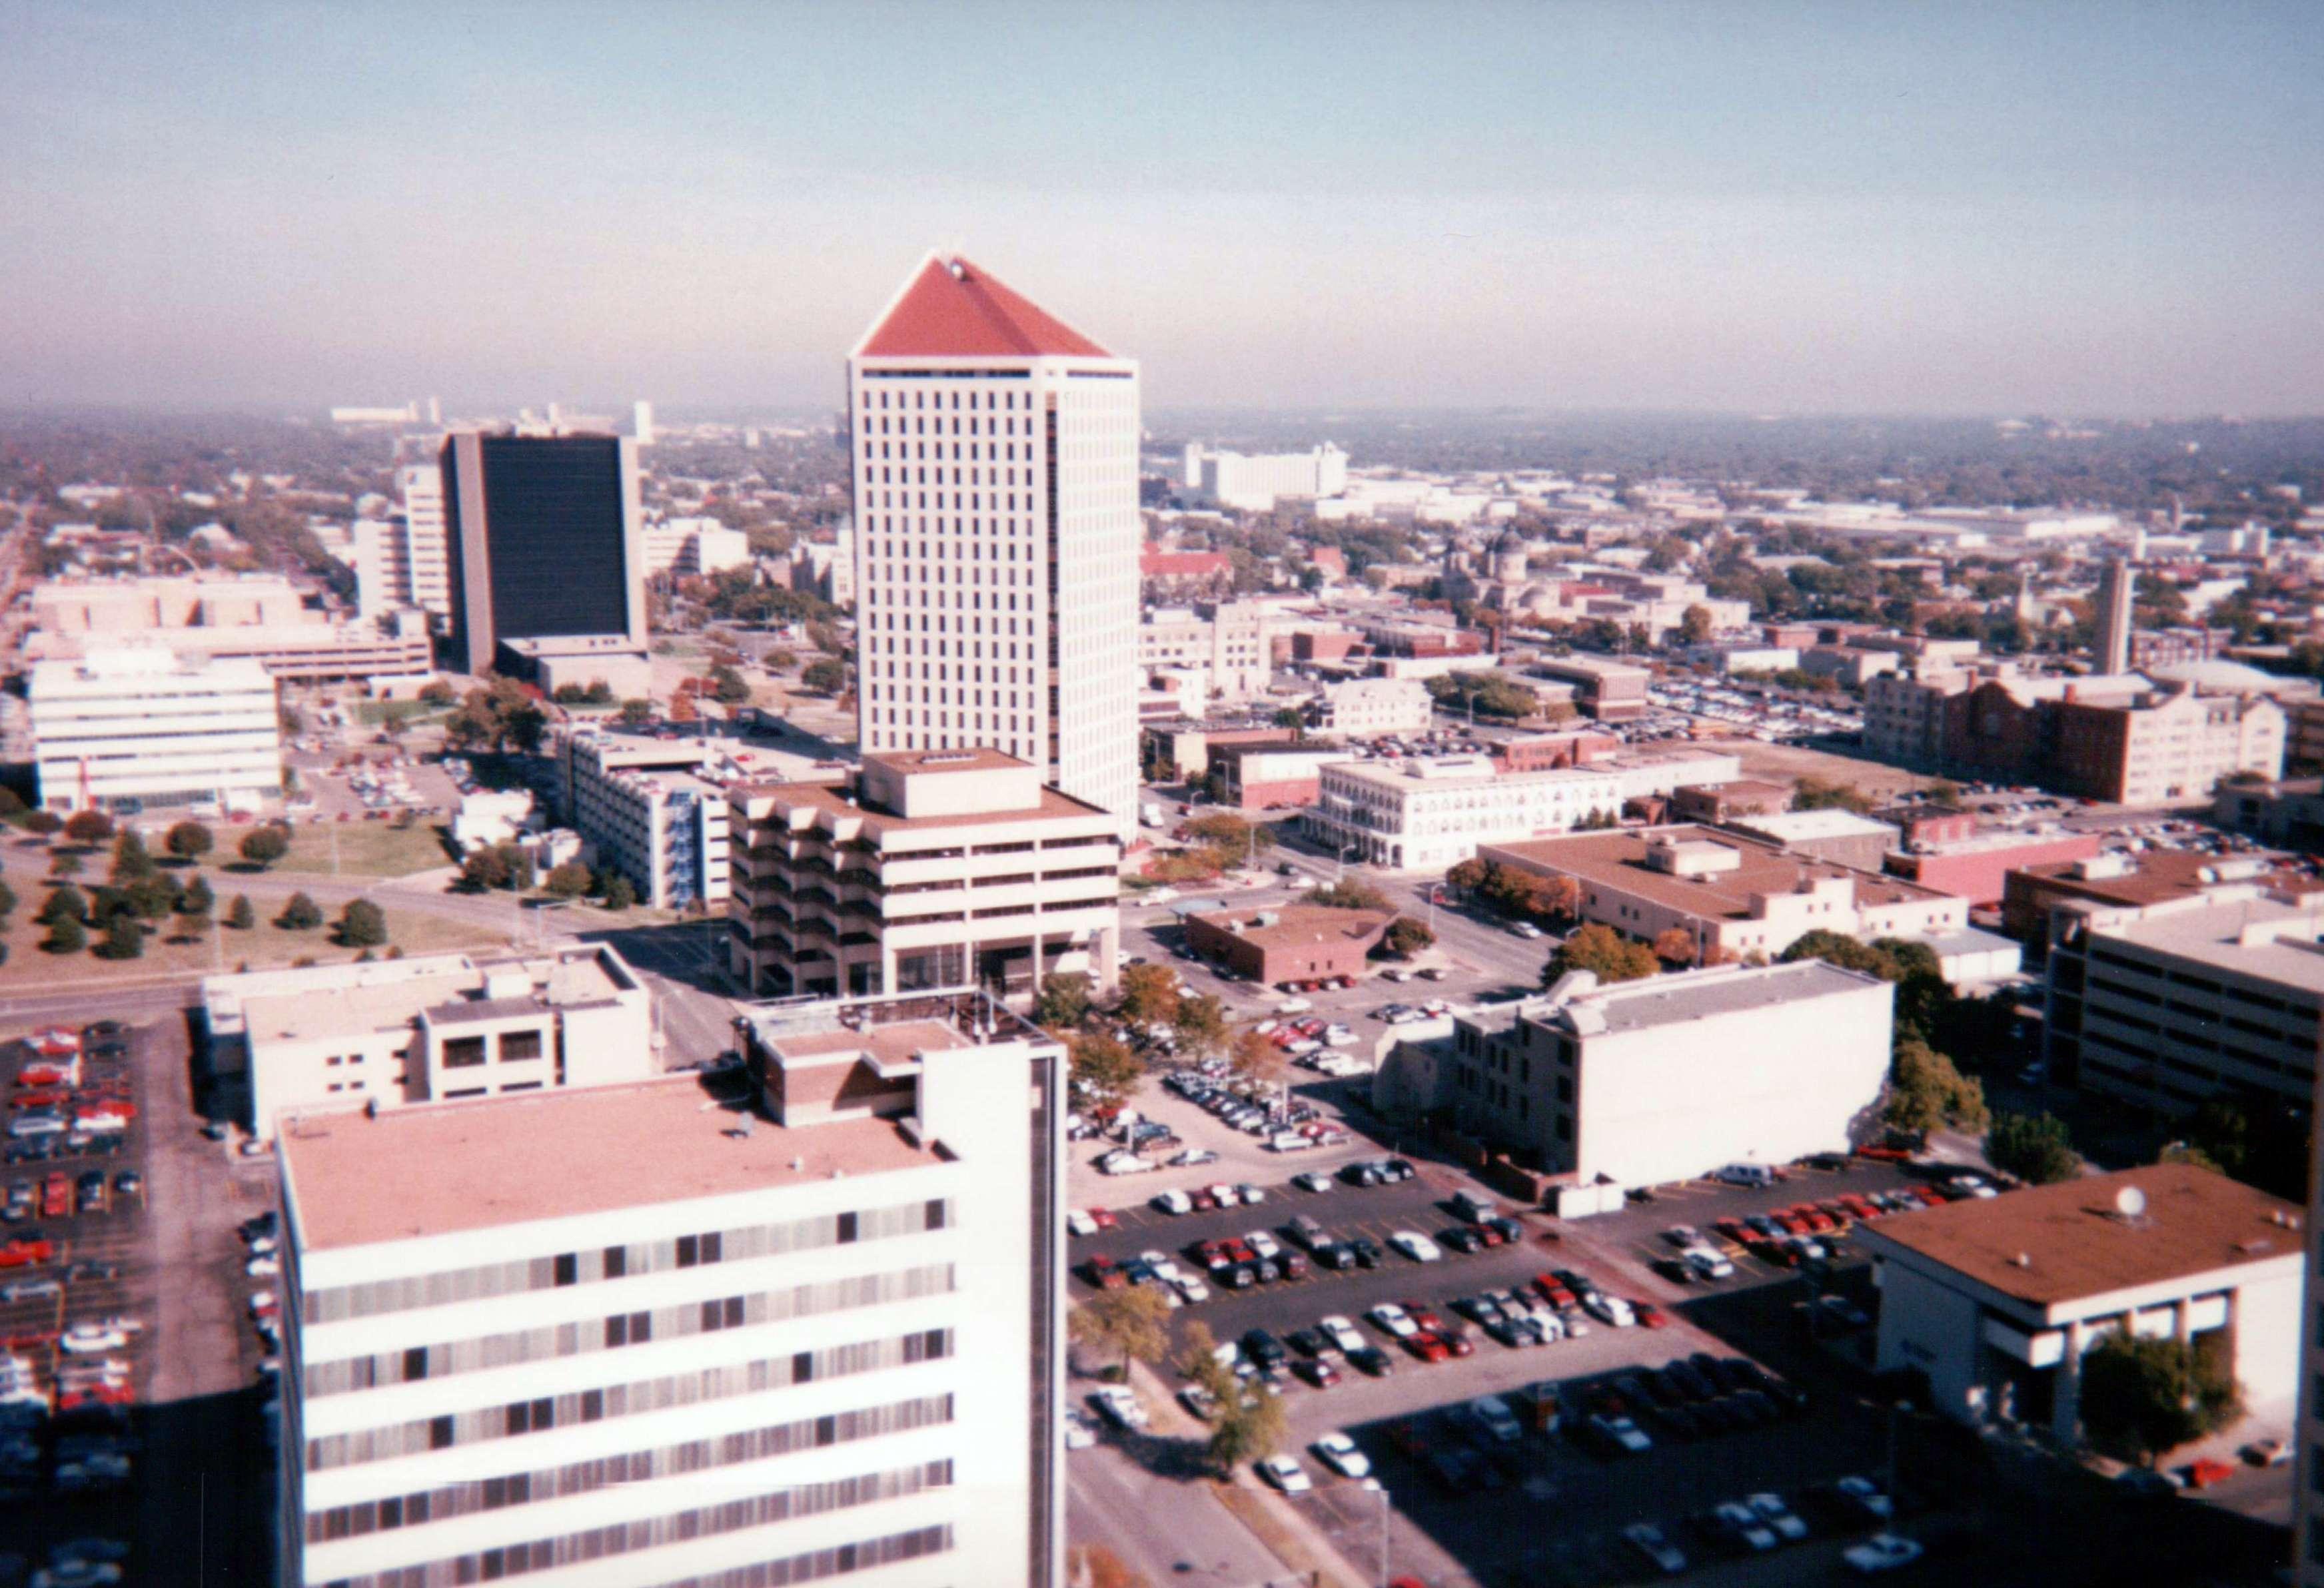 The History of Wichita's Skyline